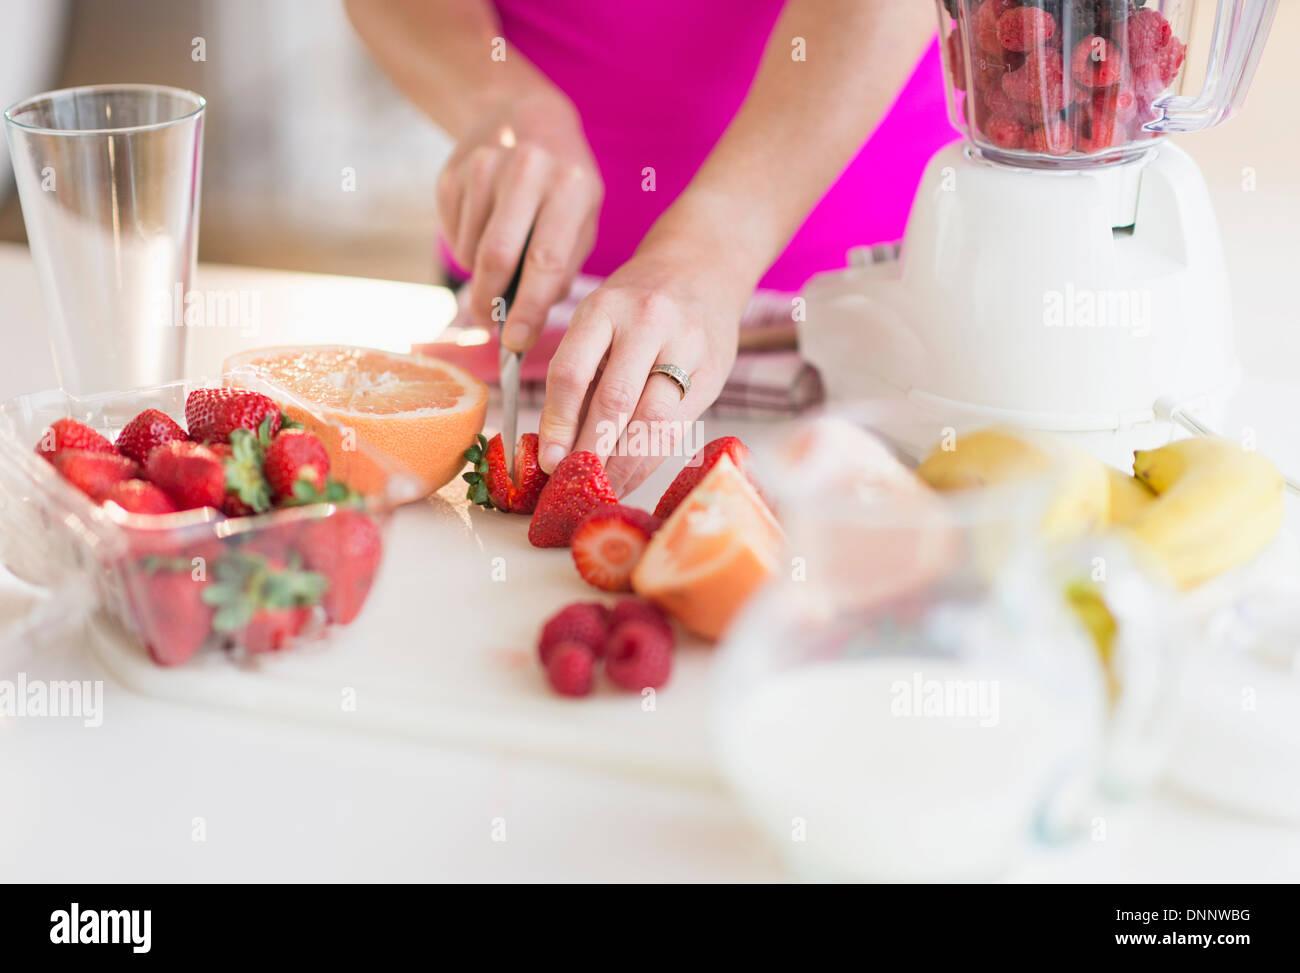 Mujer slicing fresas Imagen De Stock